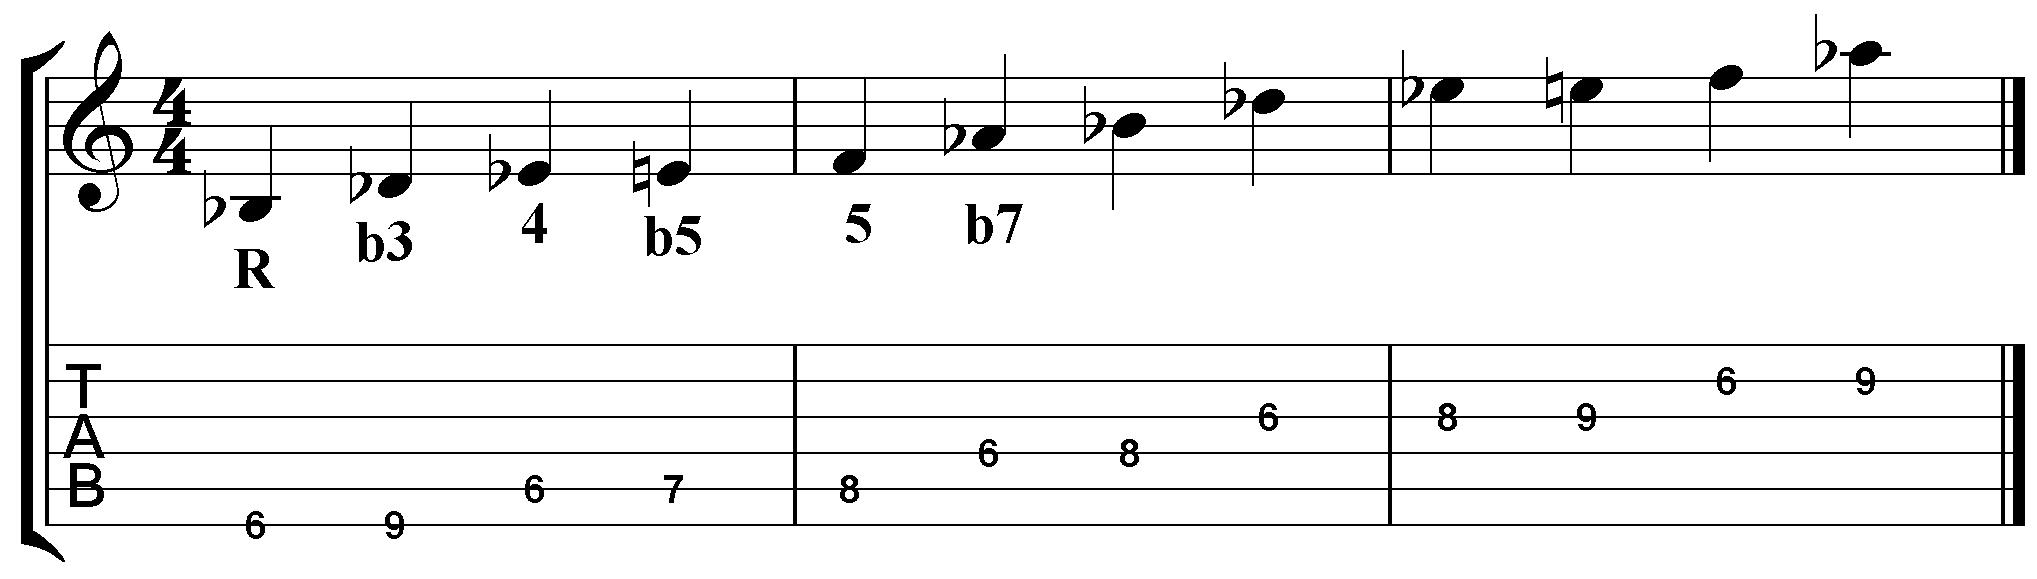 Blues Scale Lick